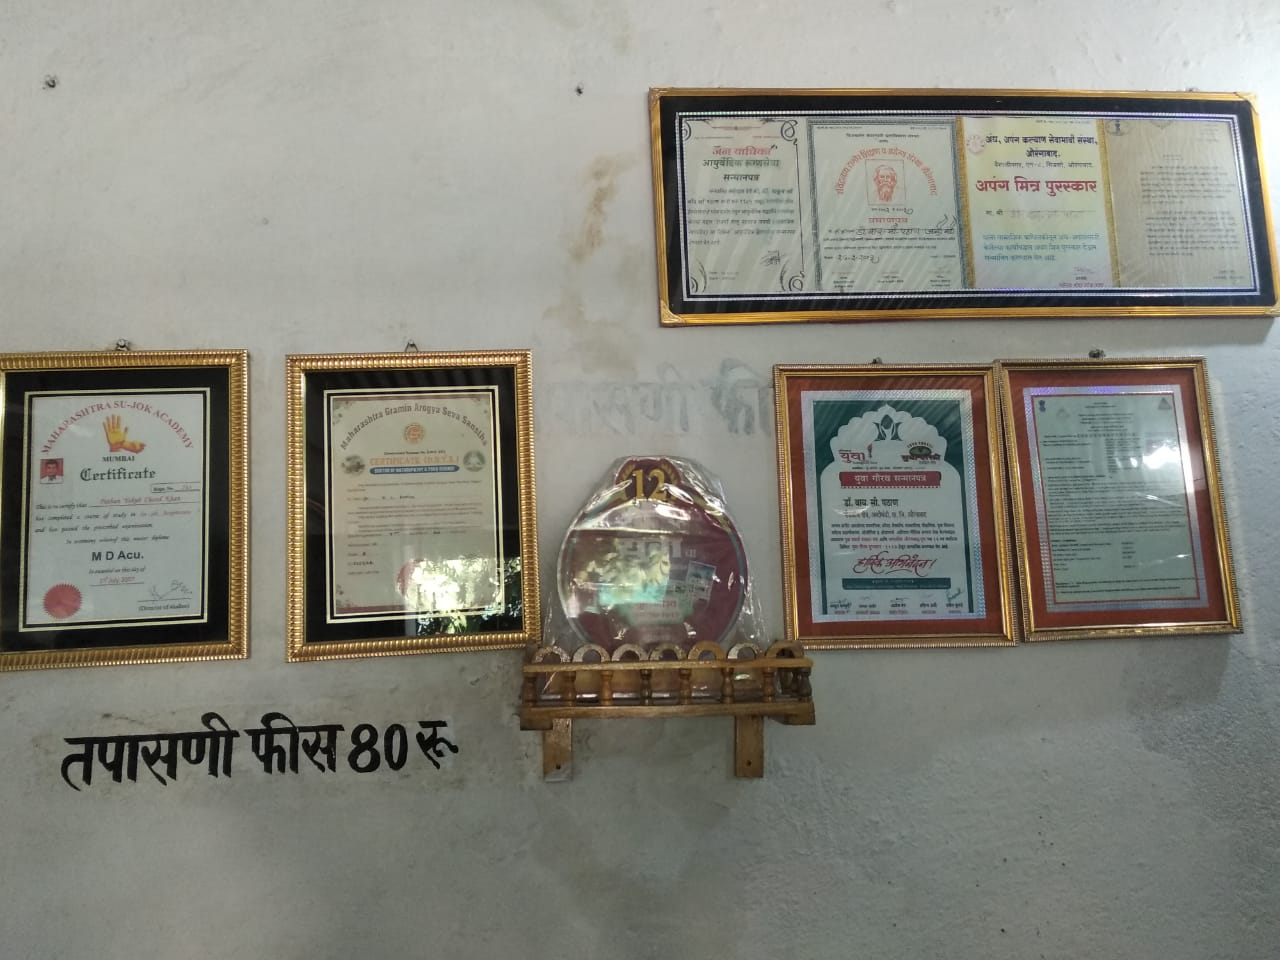 Dr.Y.C Pathan (Ayurvedic Nisarg upchar Kendra )